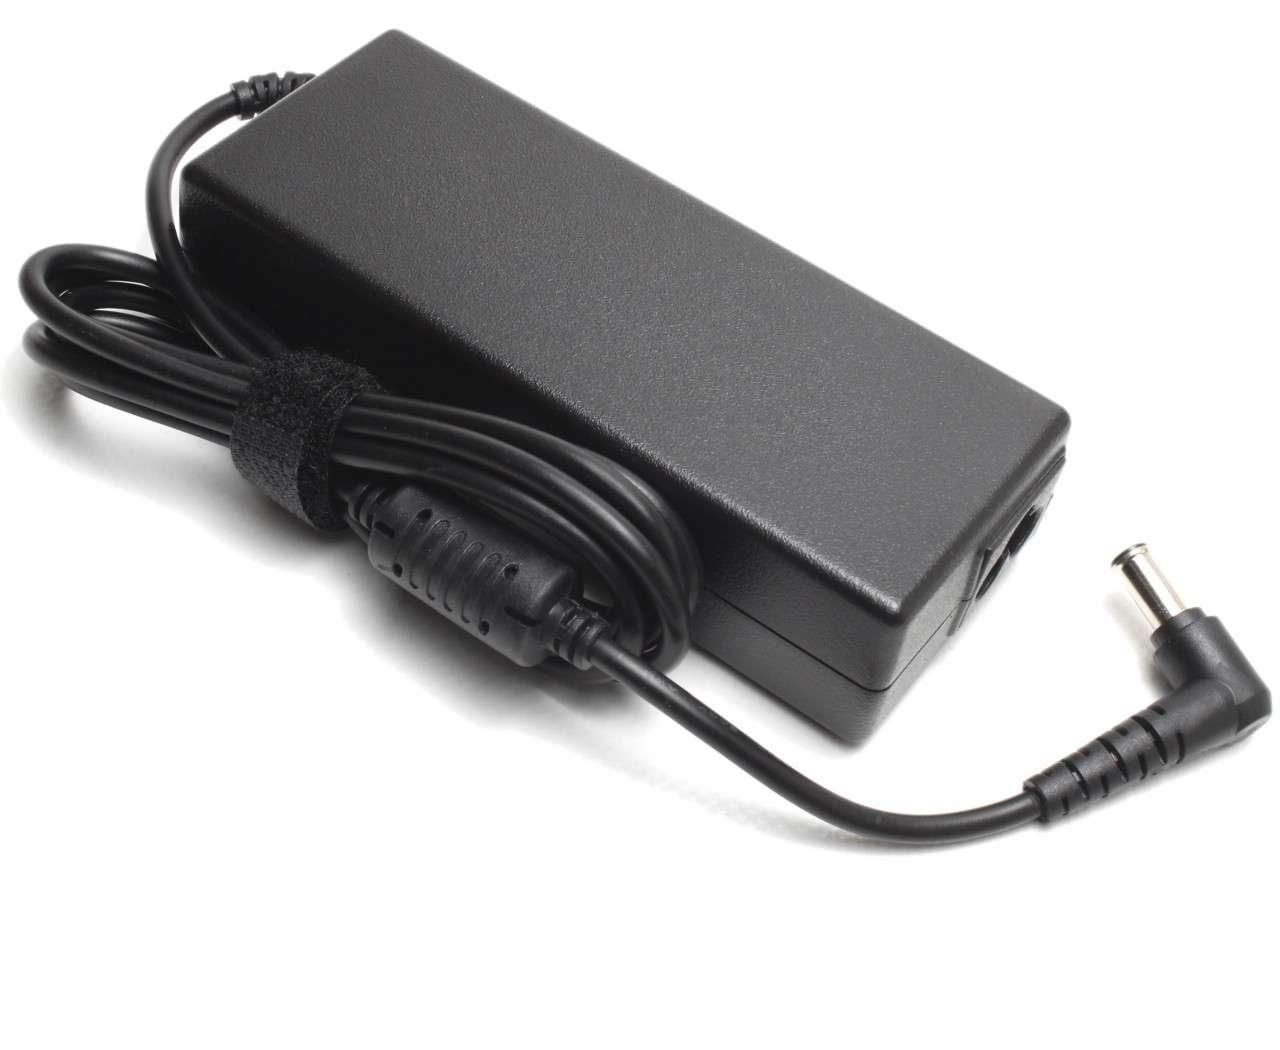 Incarcator Sony Vaio VPCEH11FX Replacement imagine powerlaptop.ro 2021